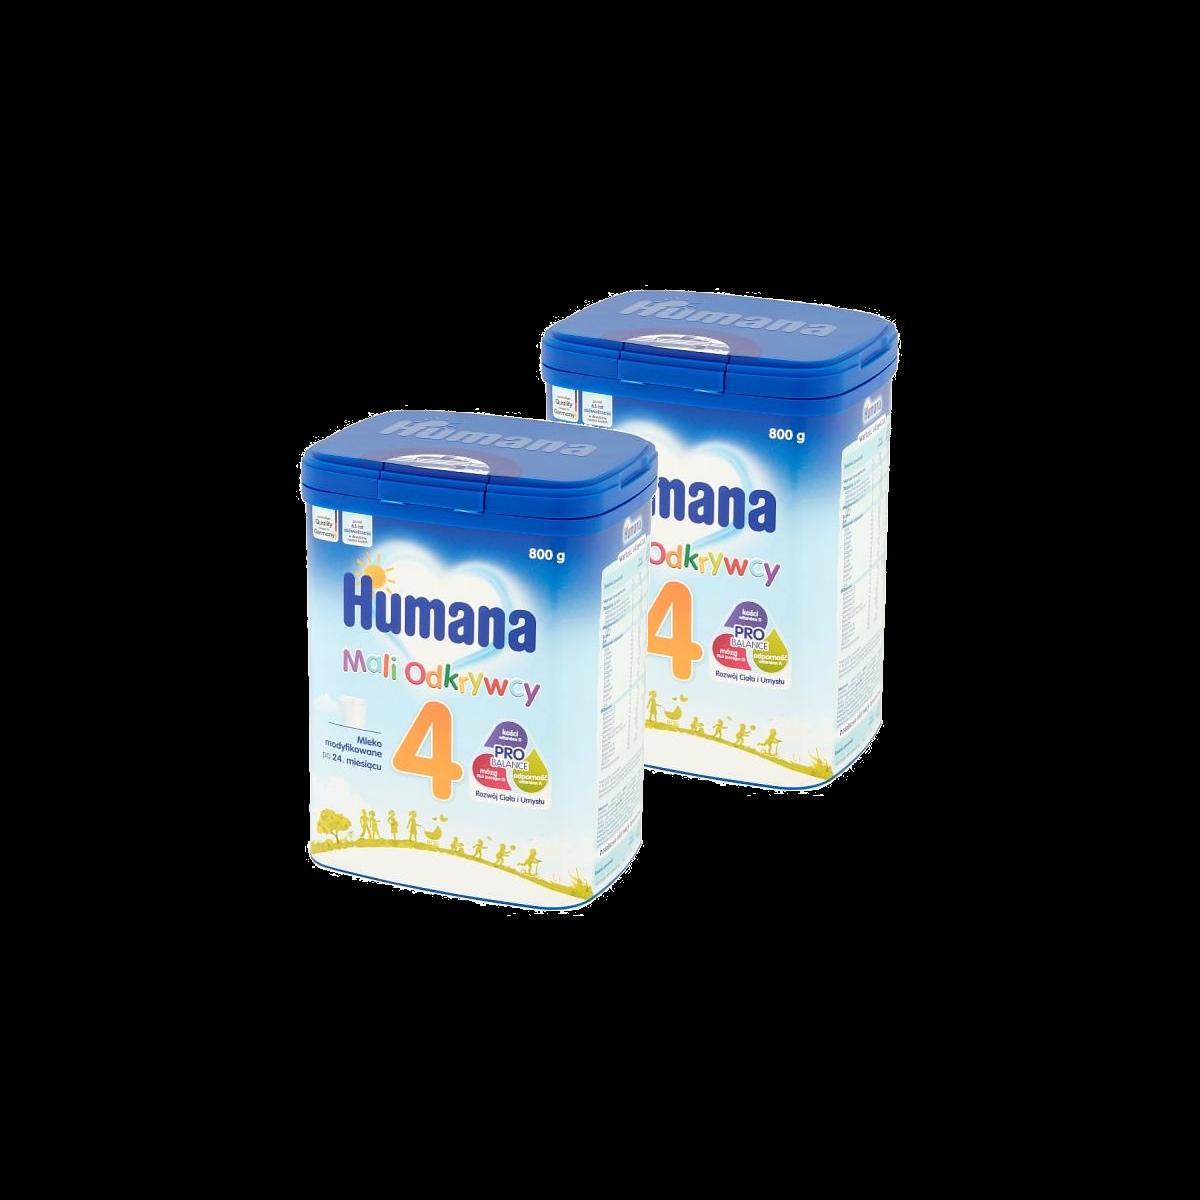 humana4_800_2pak